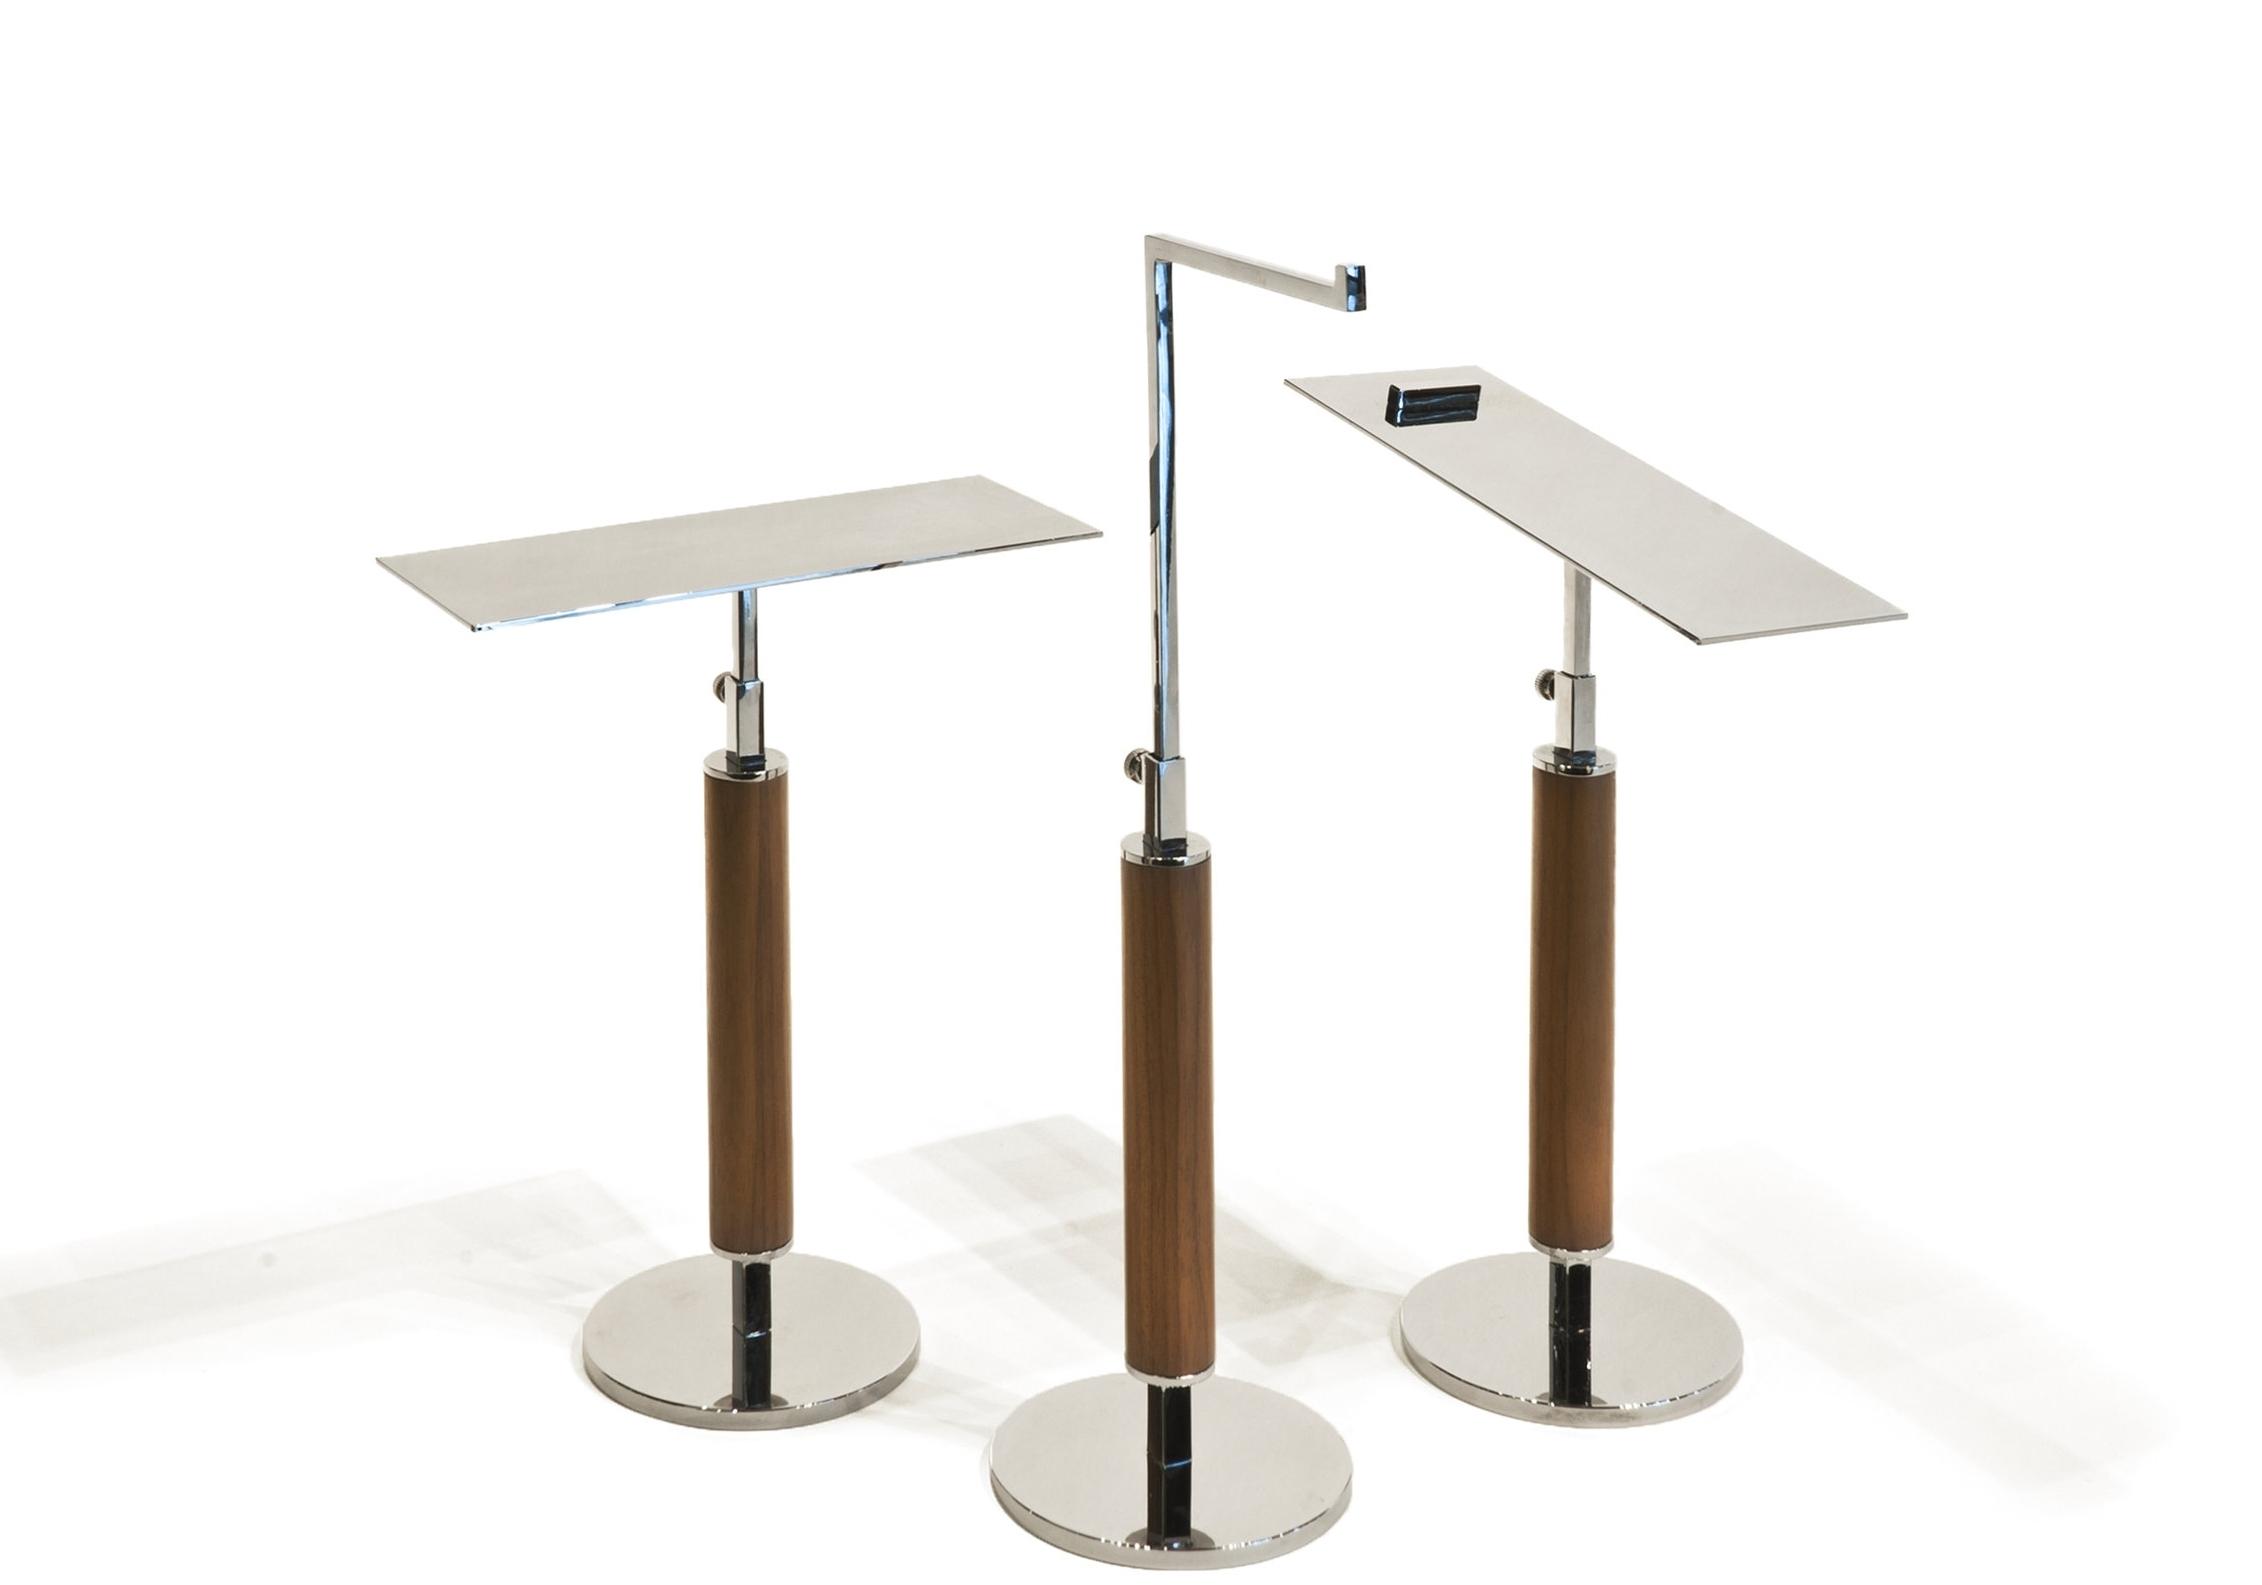 TableTop Lifts-set of 3.jpg